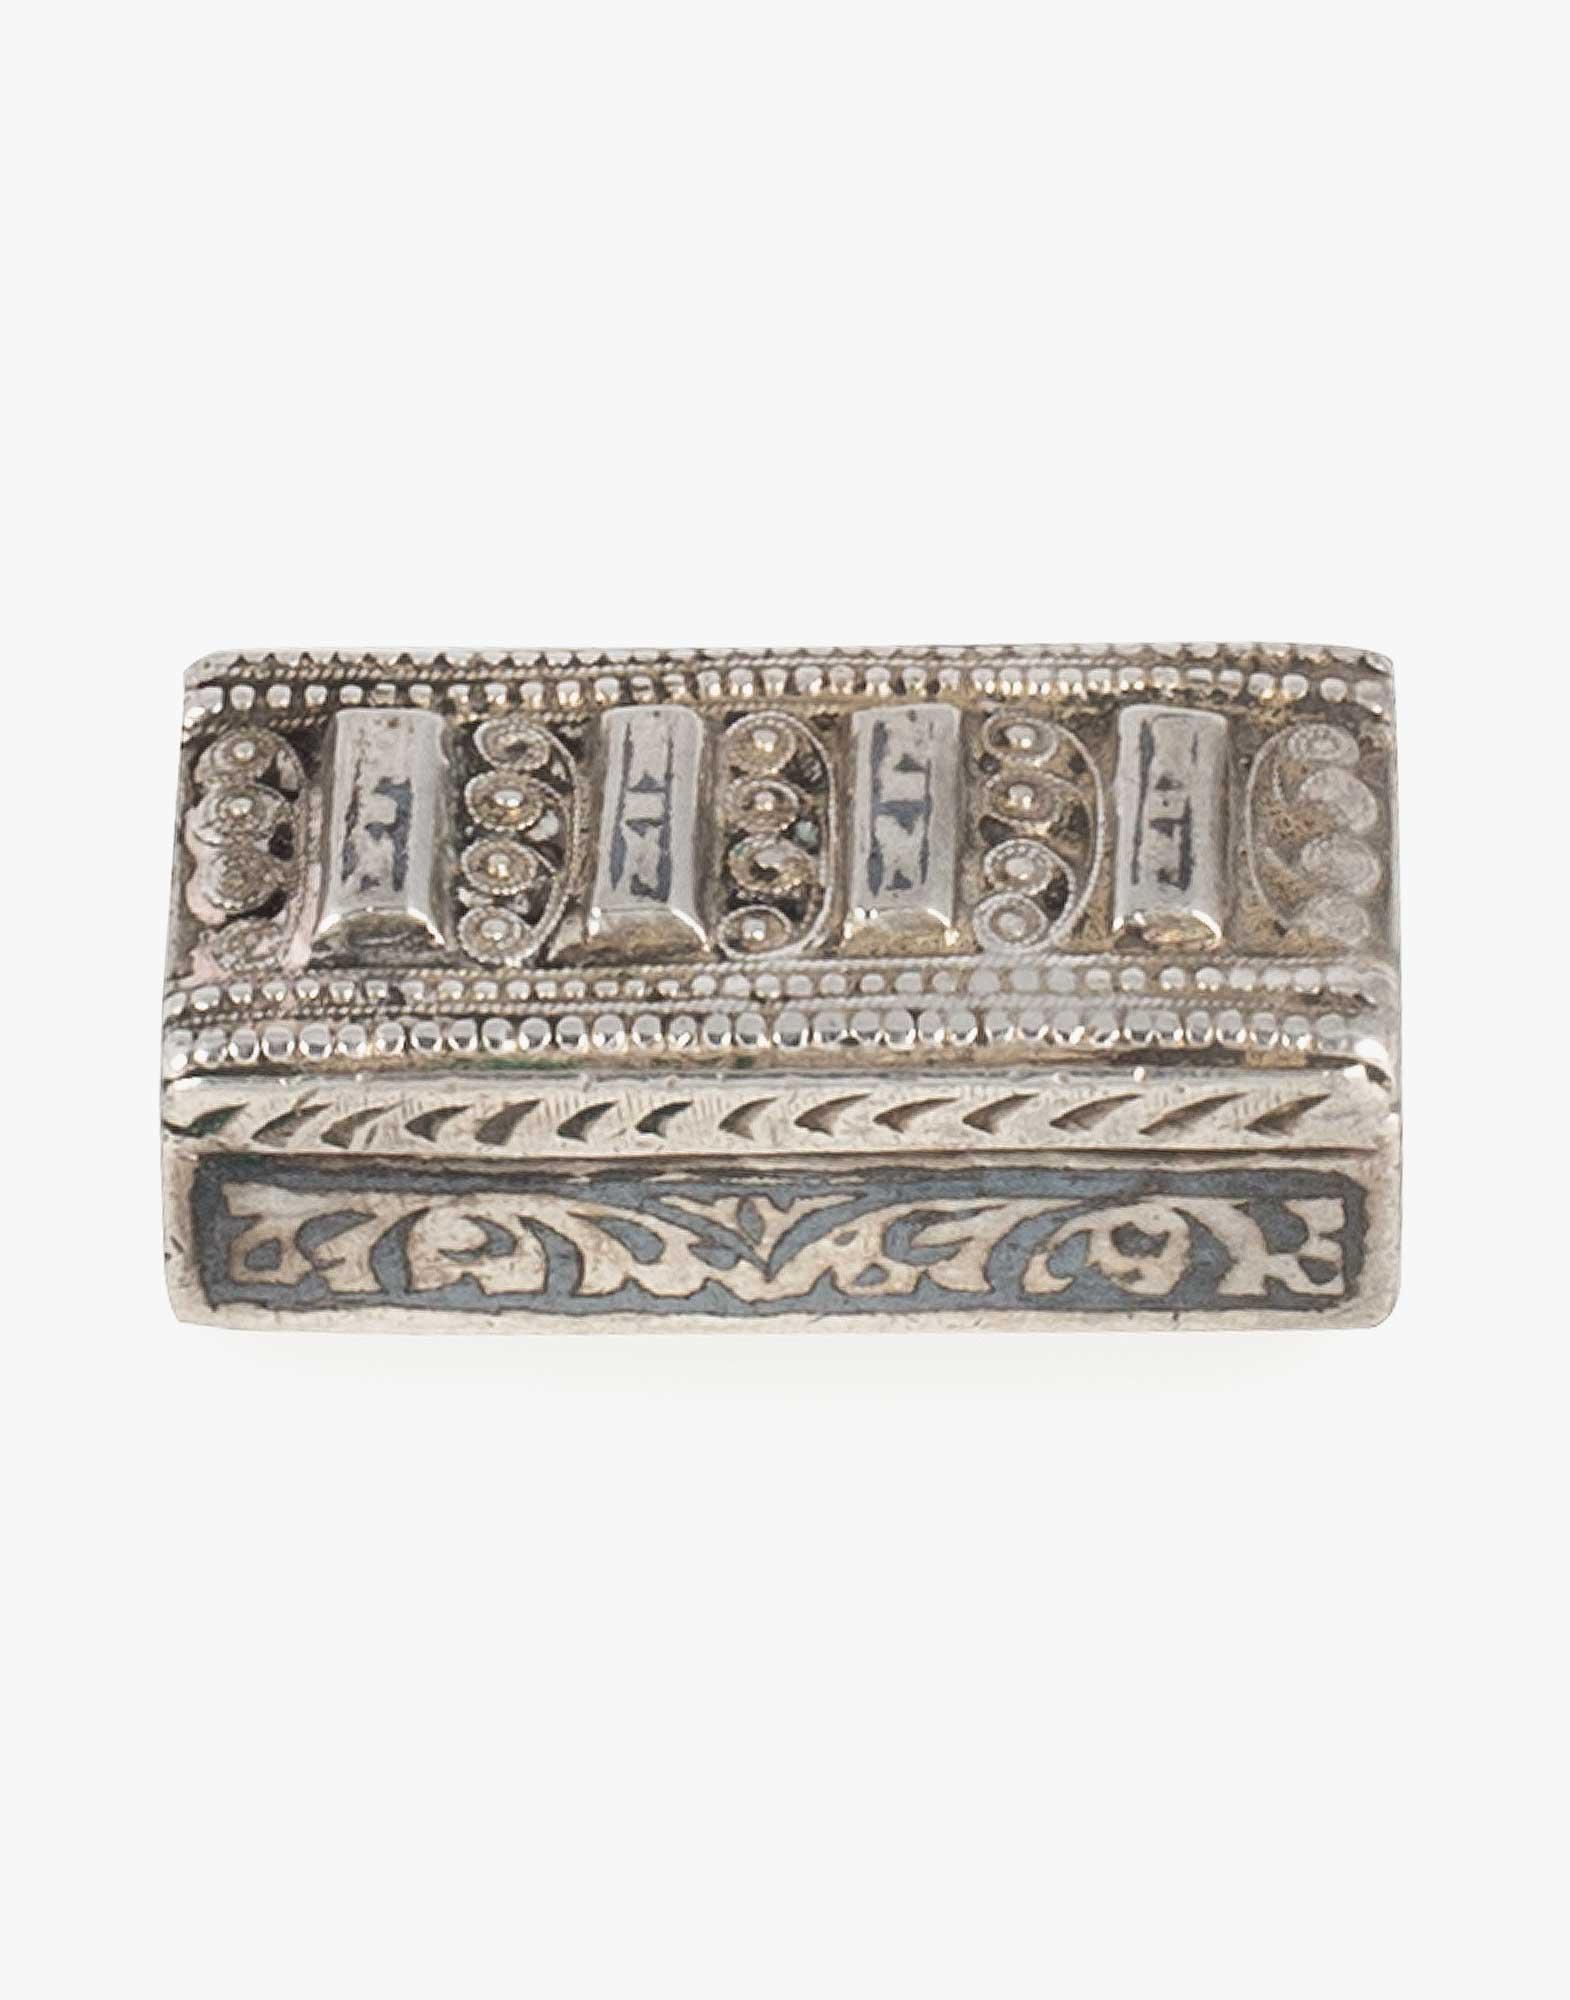 Antique Ottoman Silver Buckle